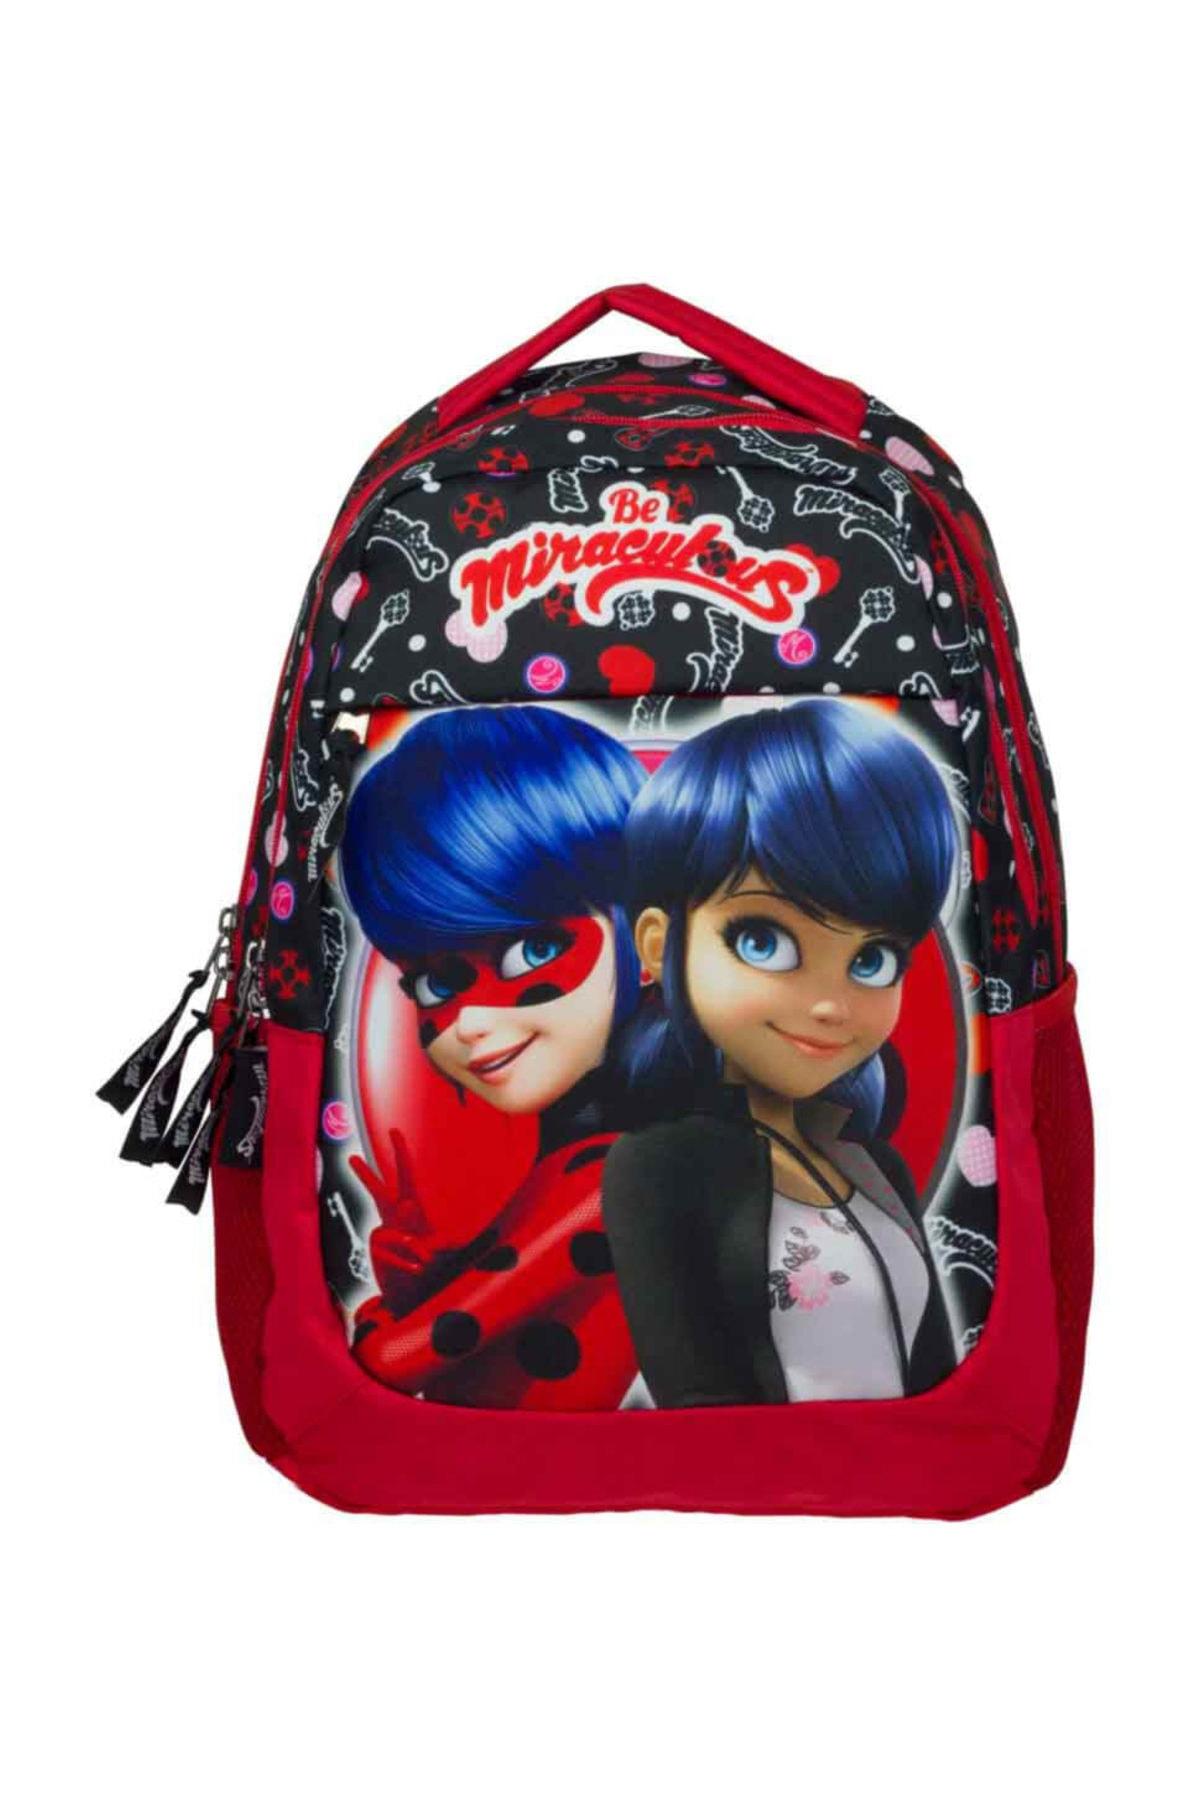 ÜMİT ÇANTA Miraculous Ladybug Okul Çantası 2223 1